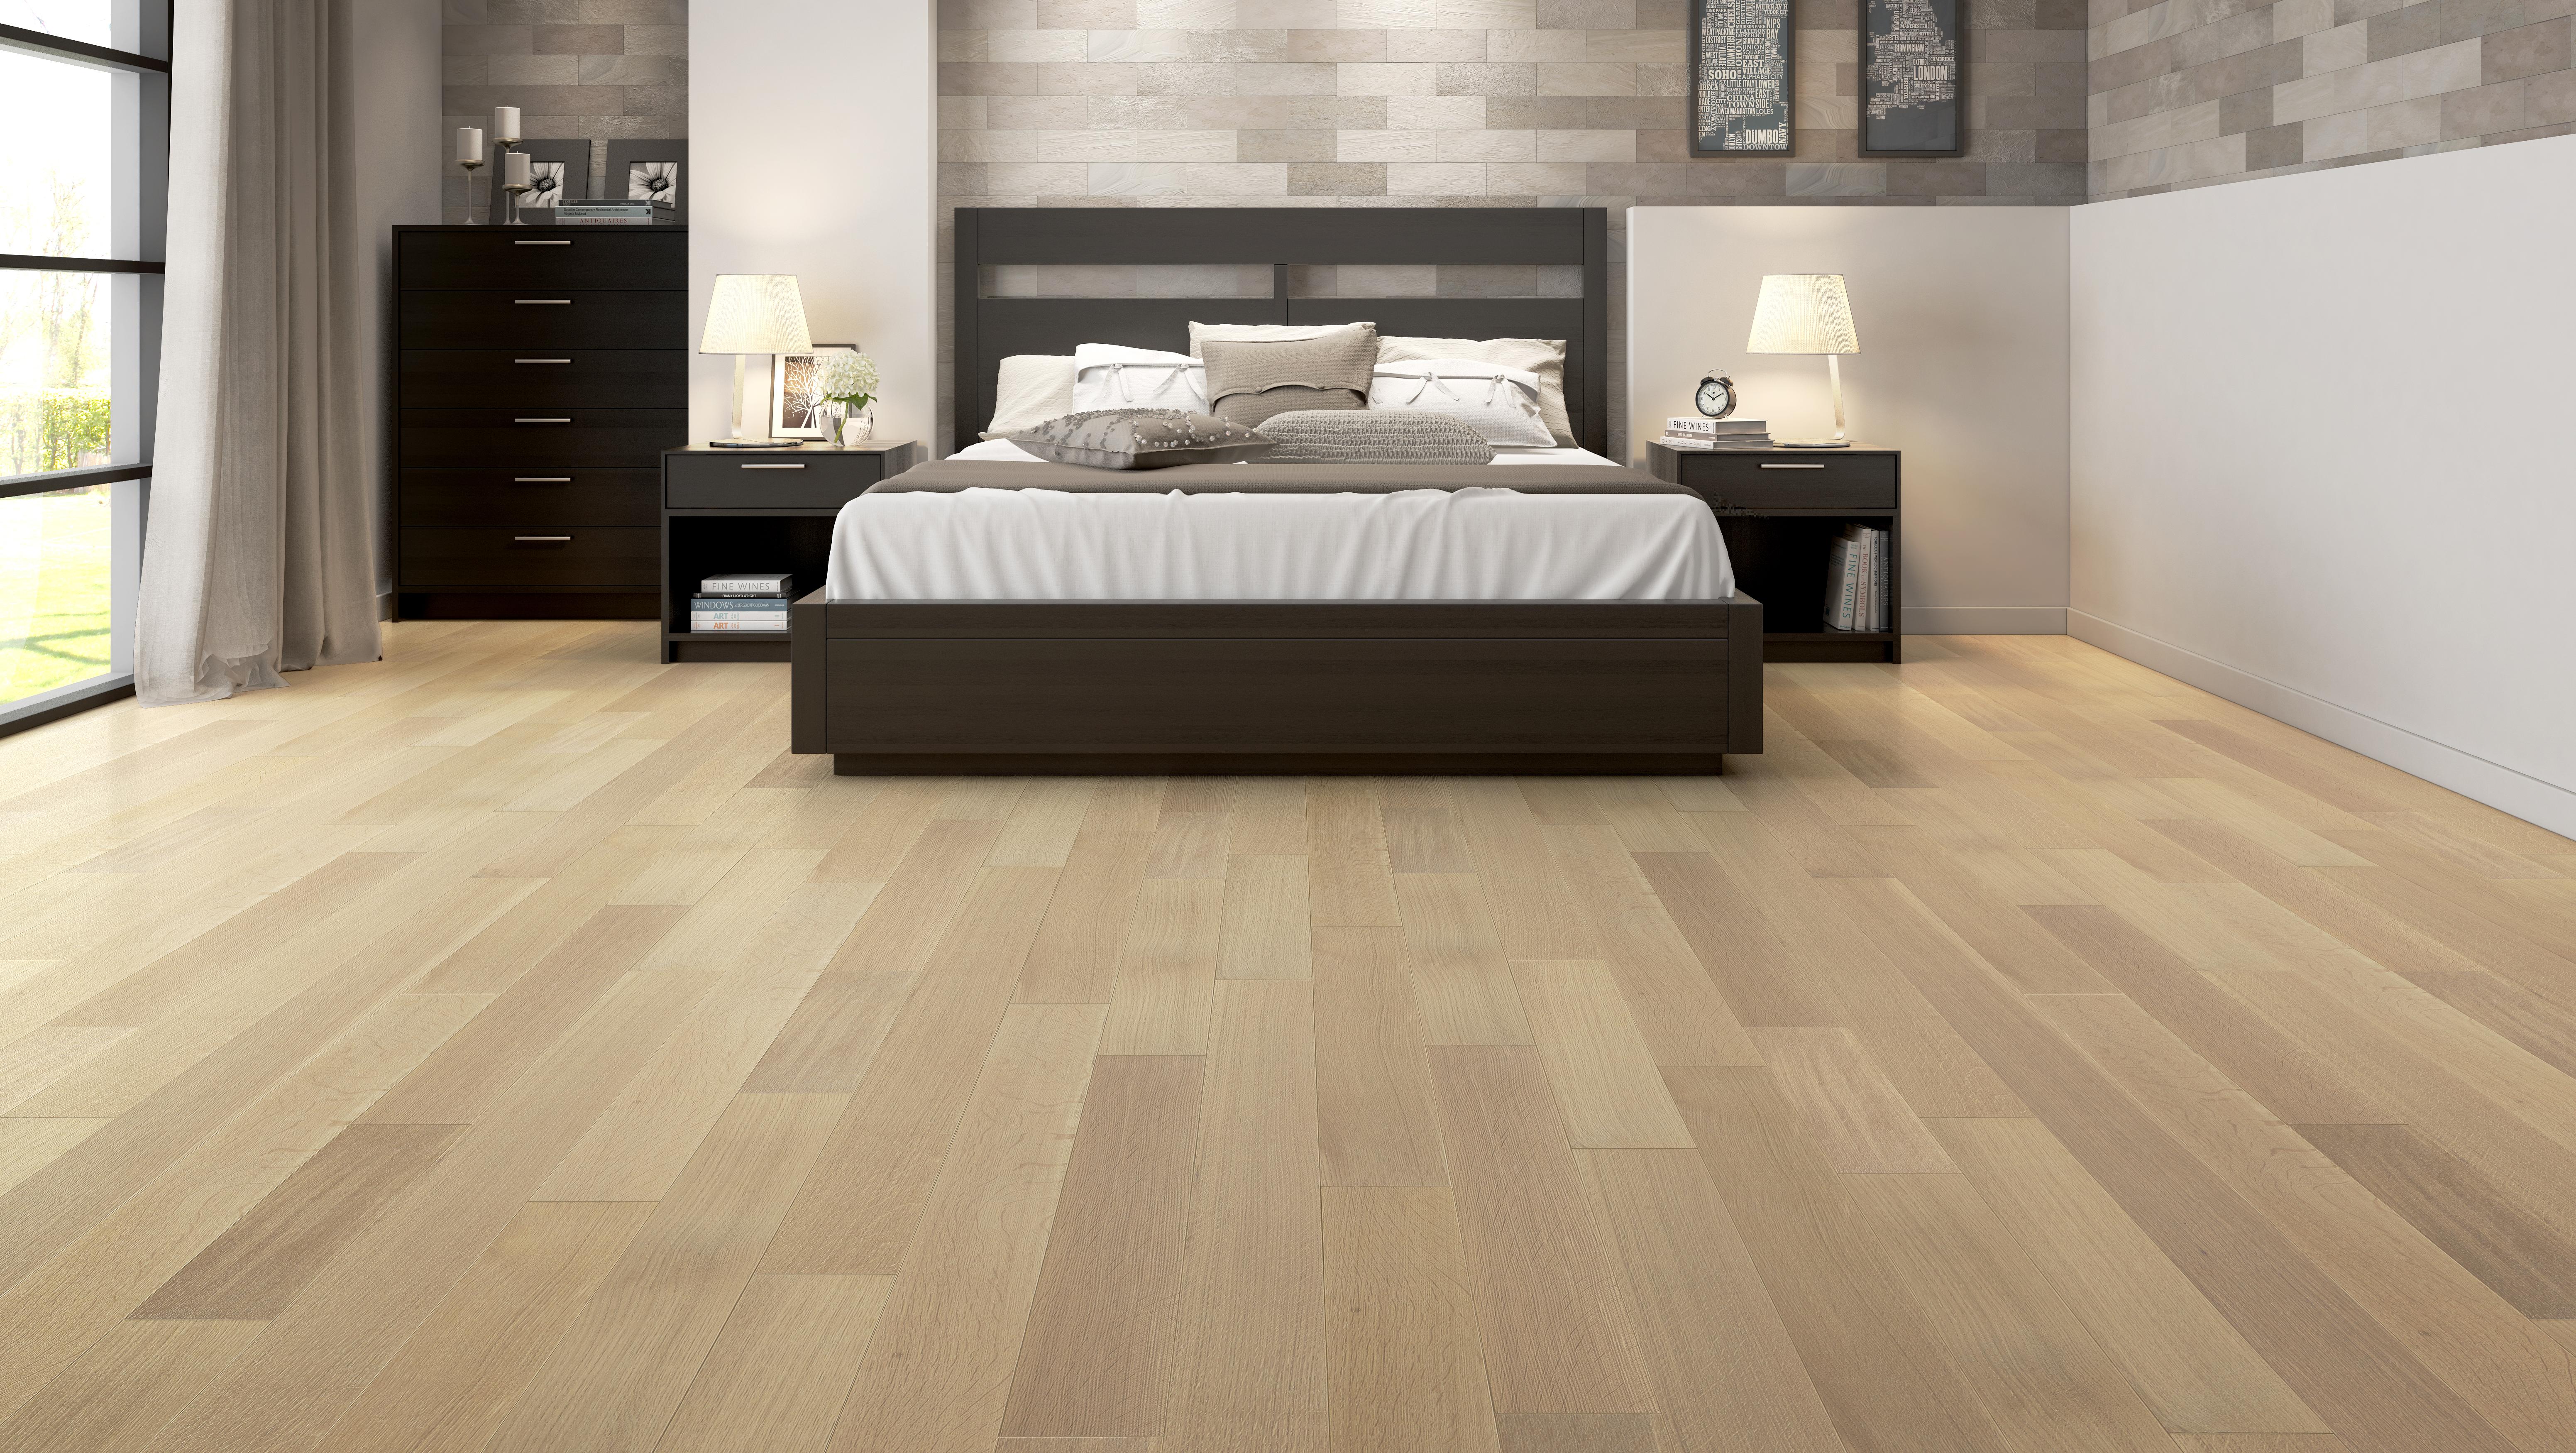 HR-MB_WhiteOak_Neoclassic_Appalachien_Flooring